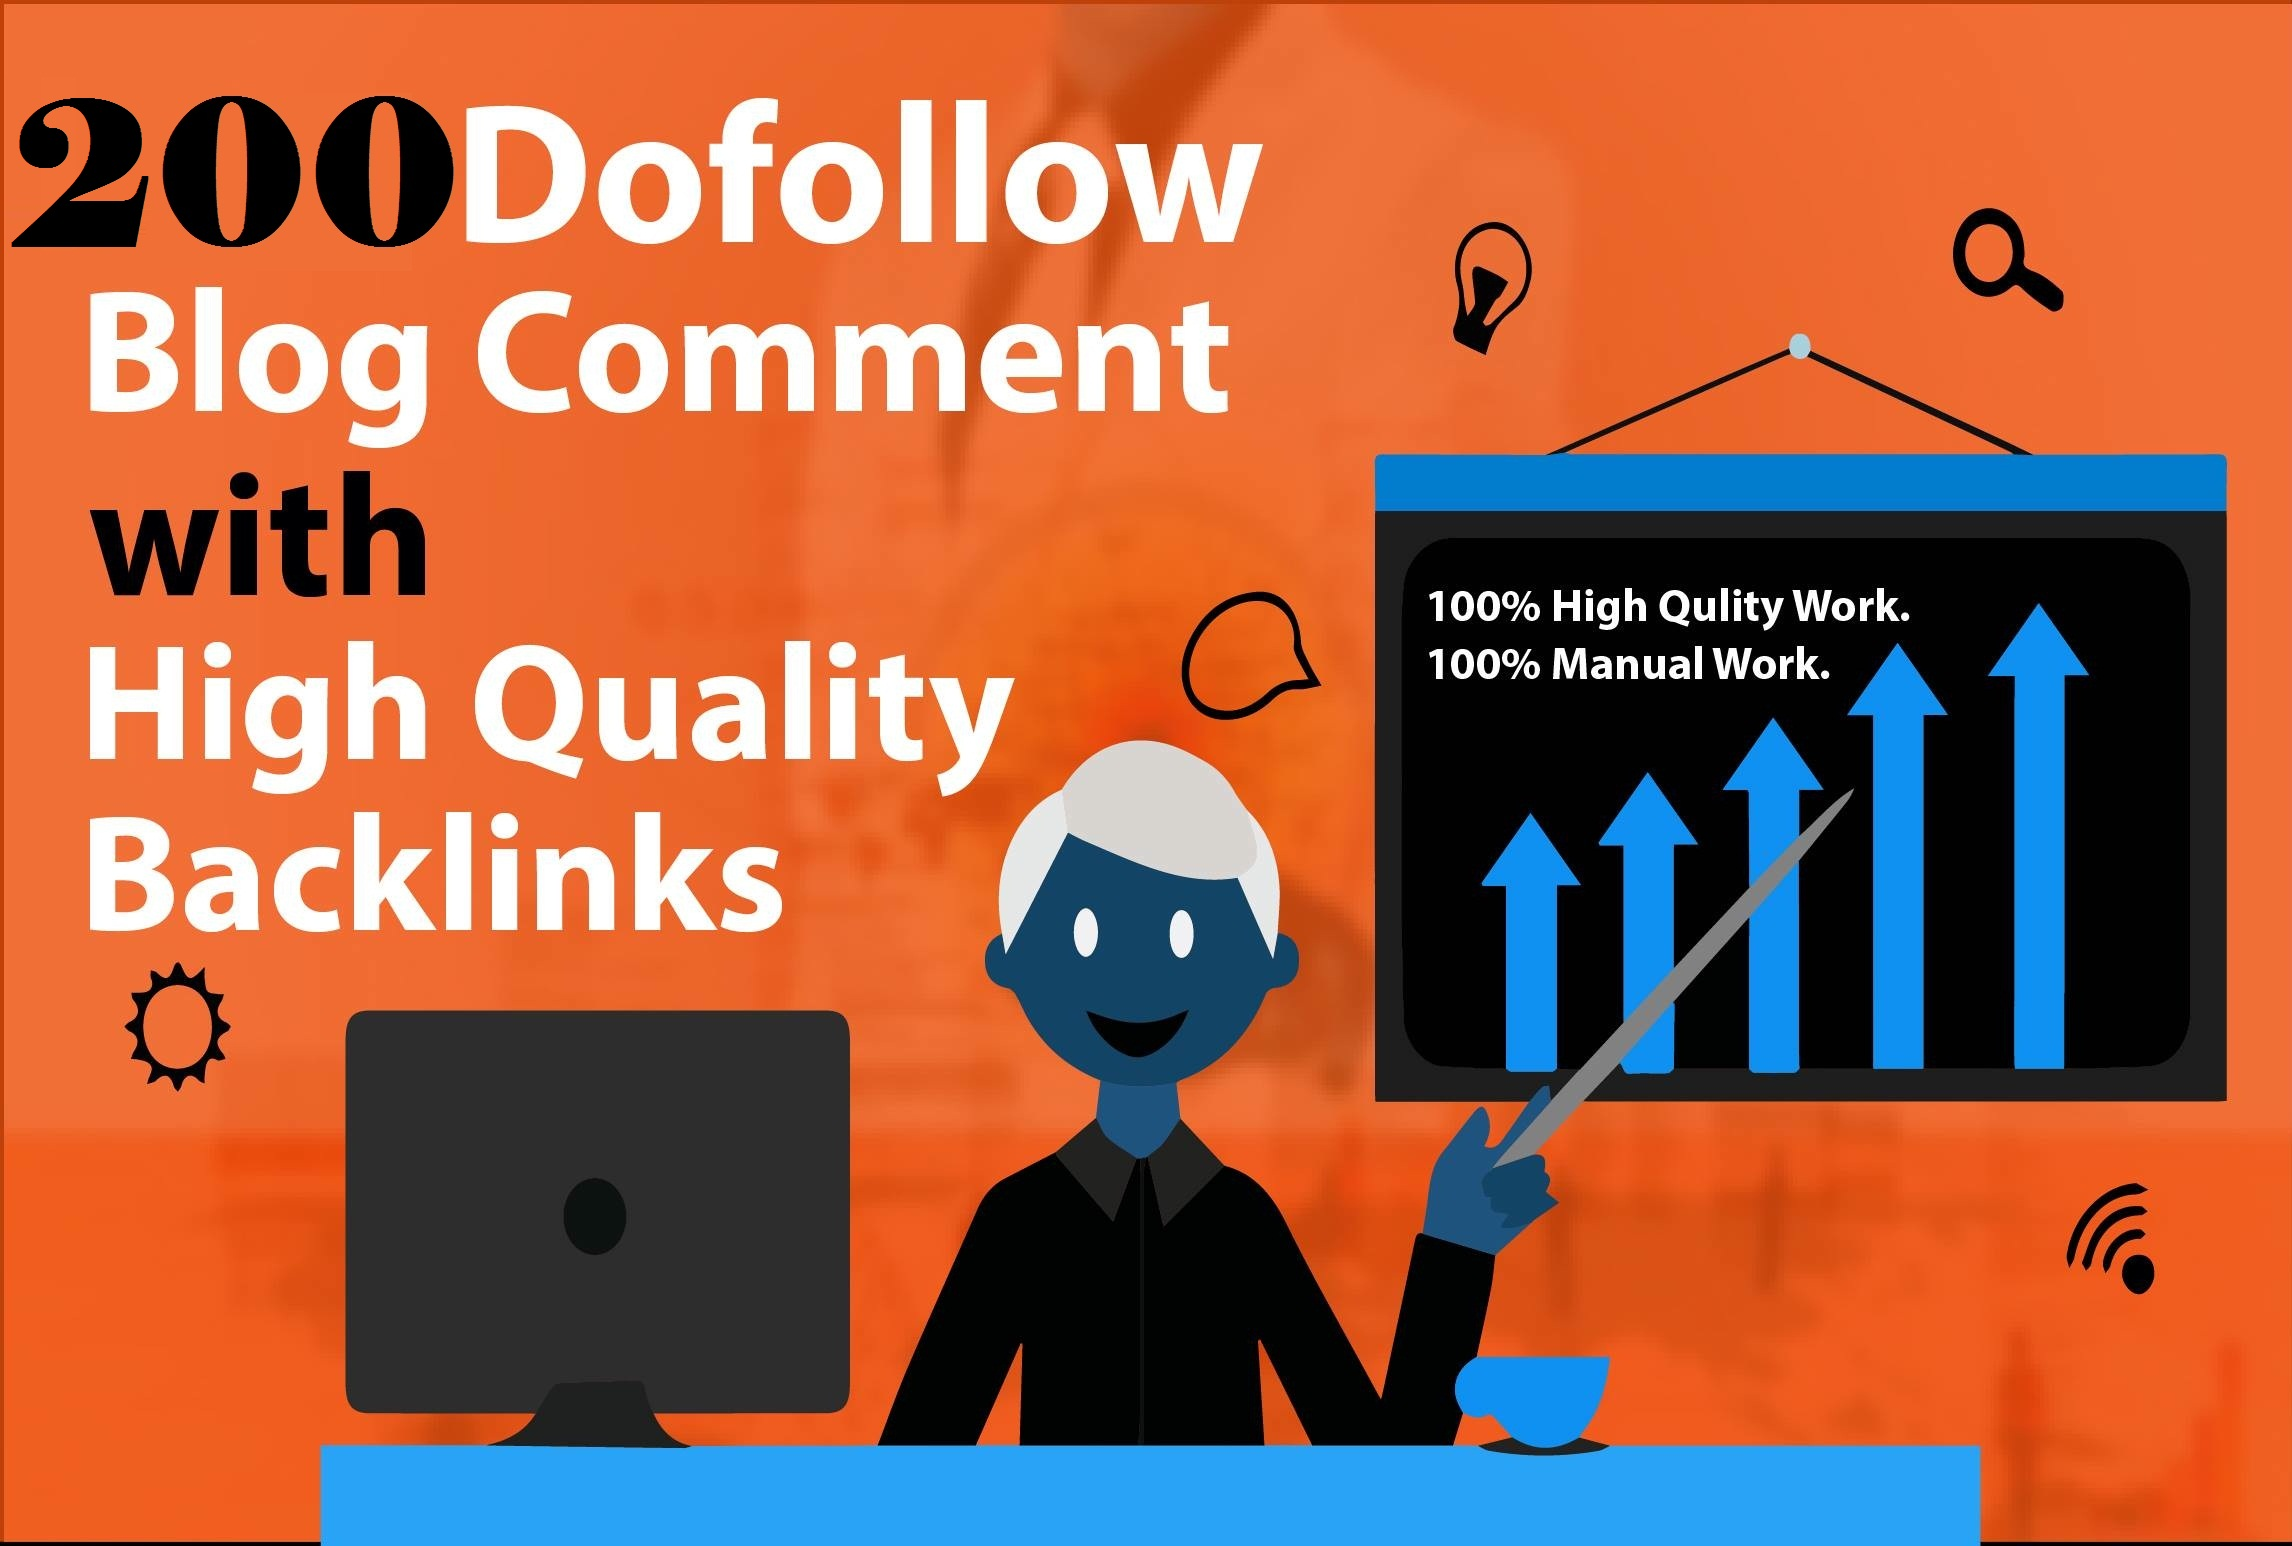 I will do 200 do-follow blog comment